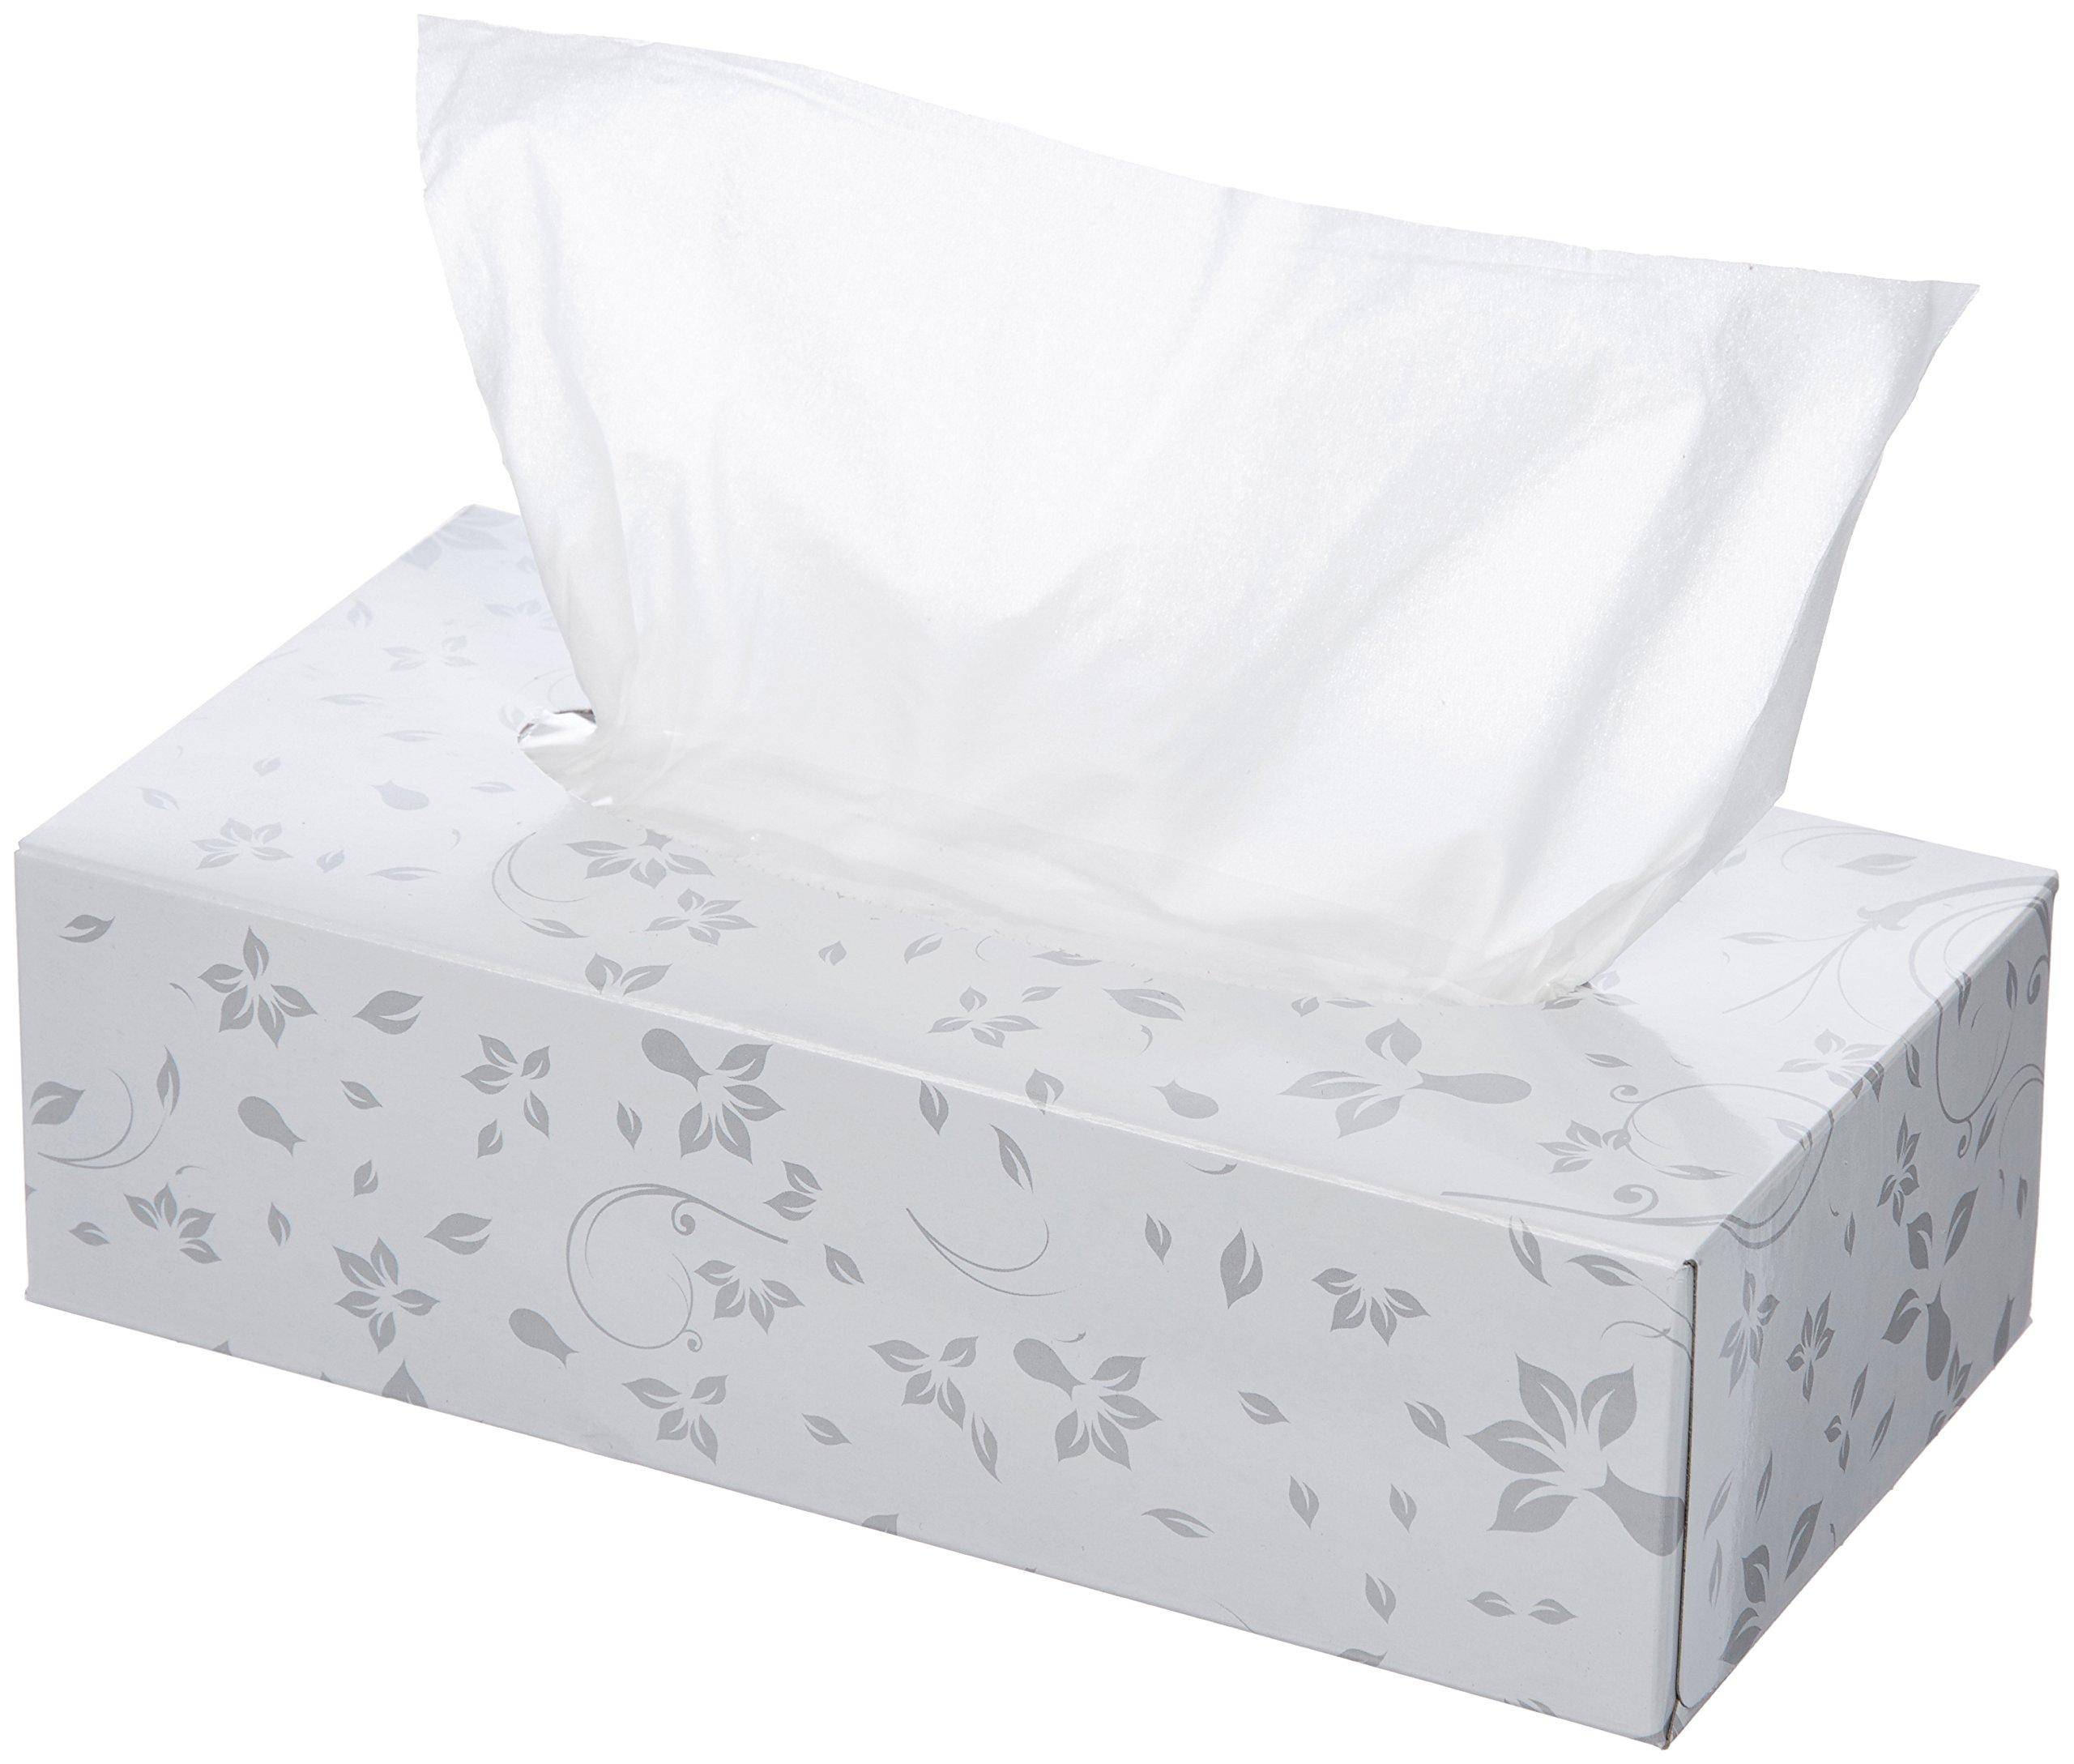 AmazonBasics Professional Facial Tissue Flat Box for Businesses, 2-Ply, White, 125 Tissues per Box, 48 Boxes